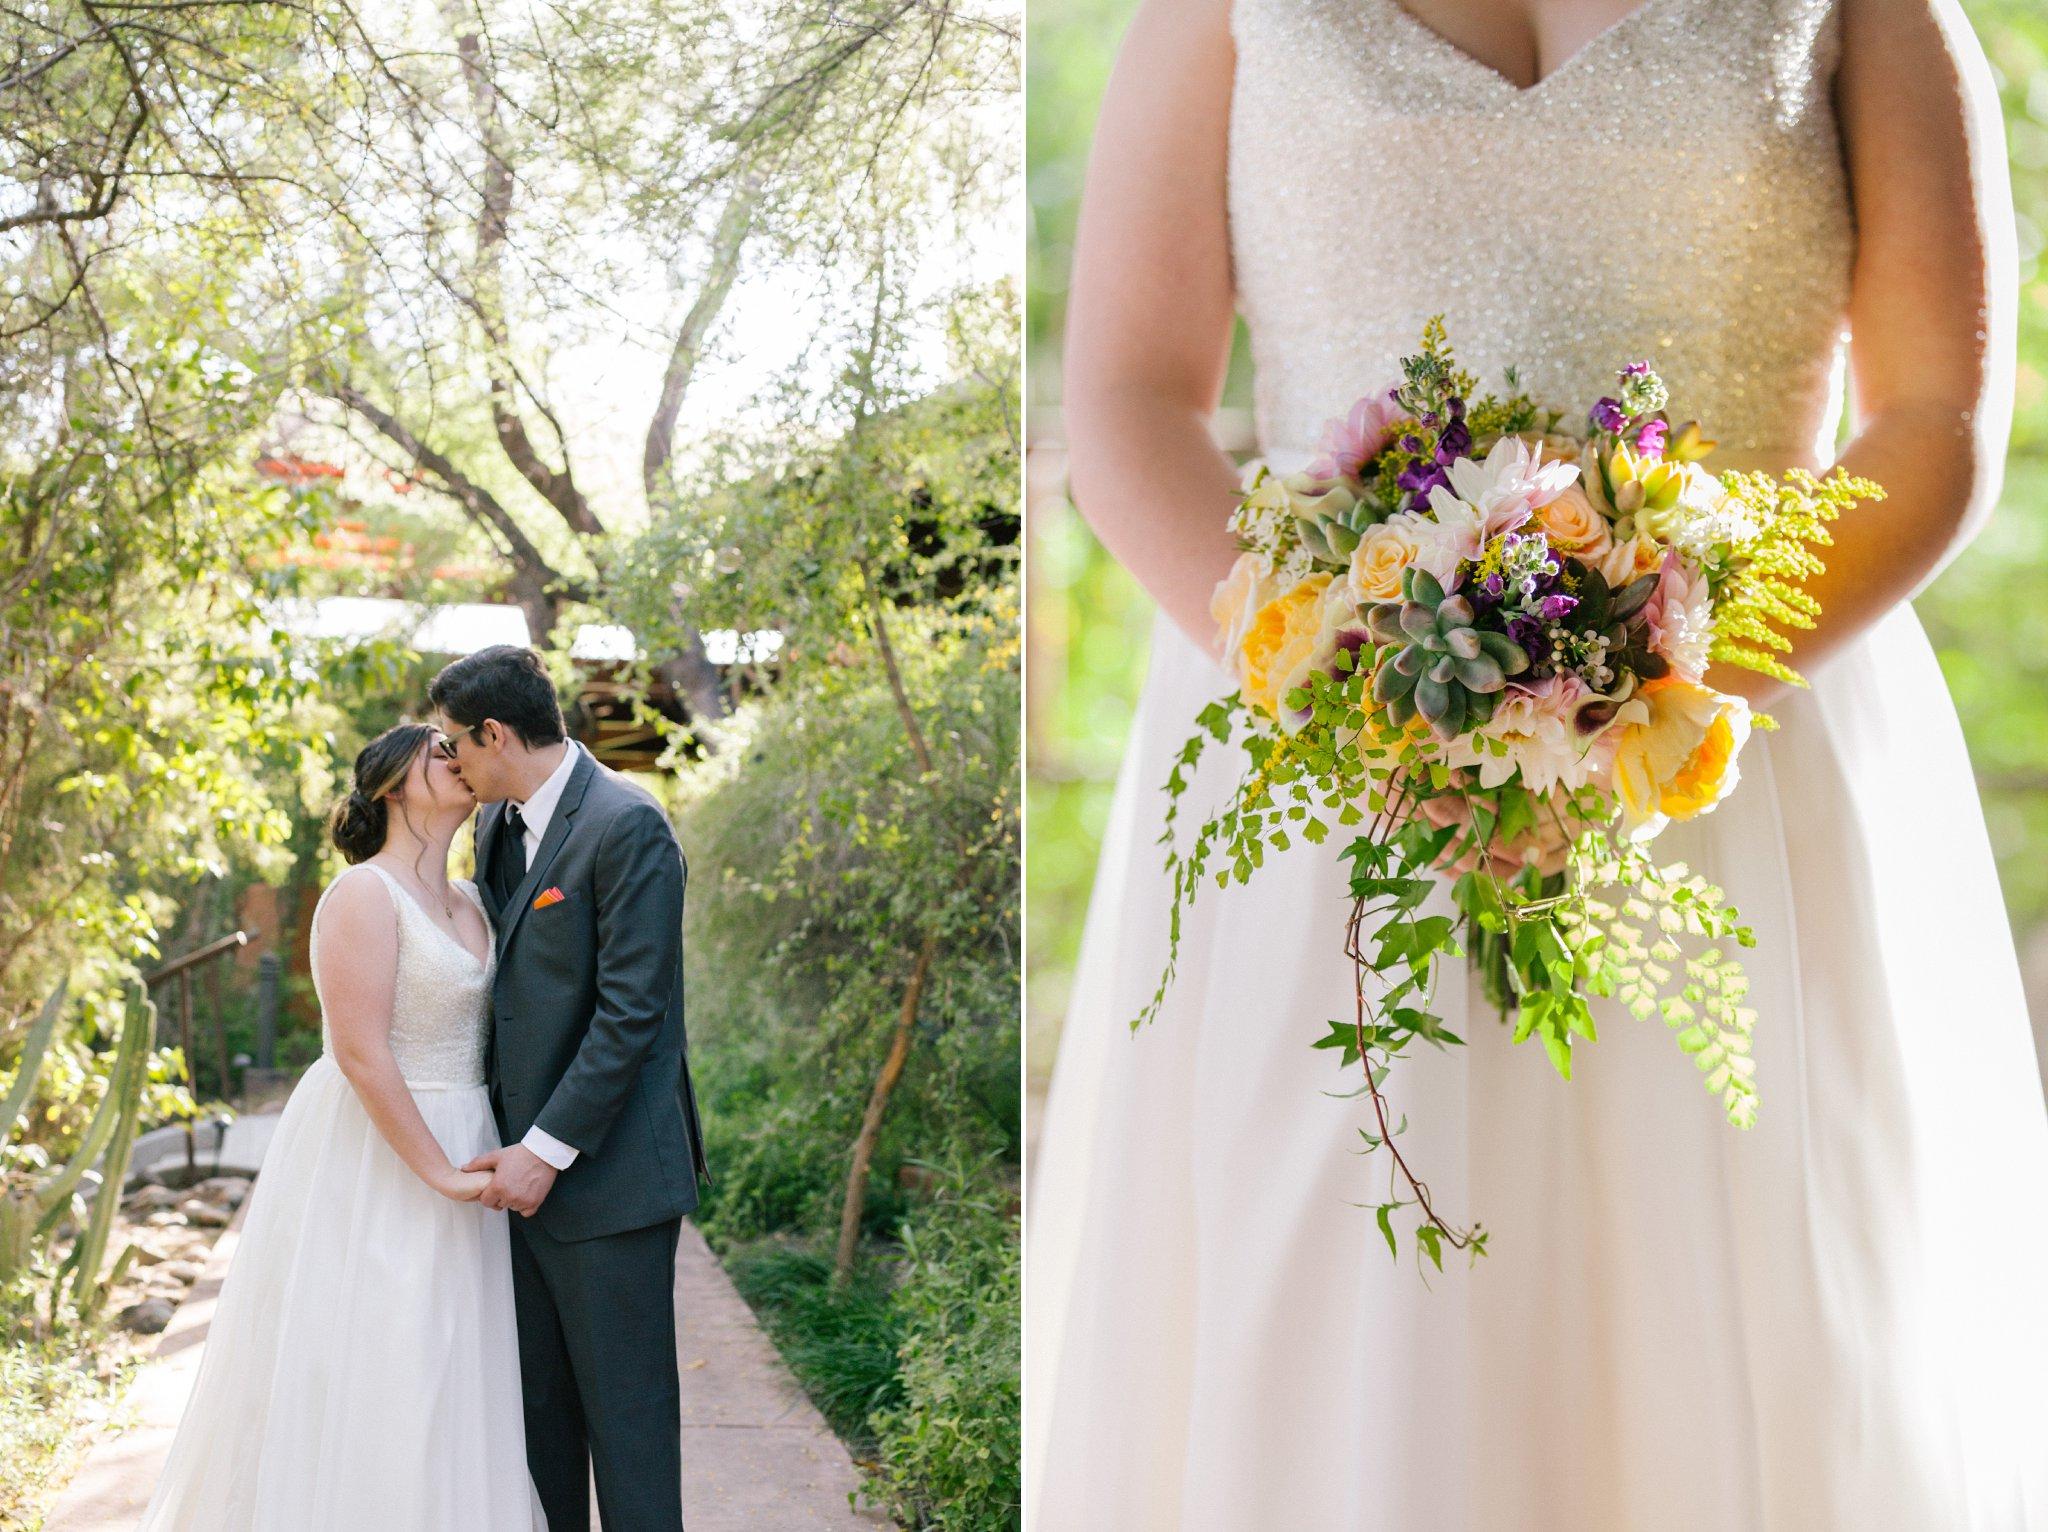 bride & groom at Phoenix Zoo wedding by Alyssa Campbell Photography